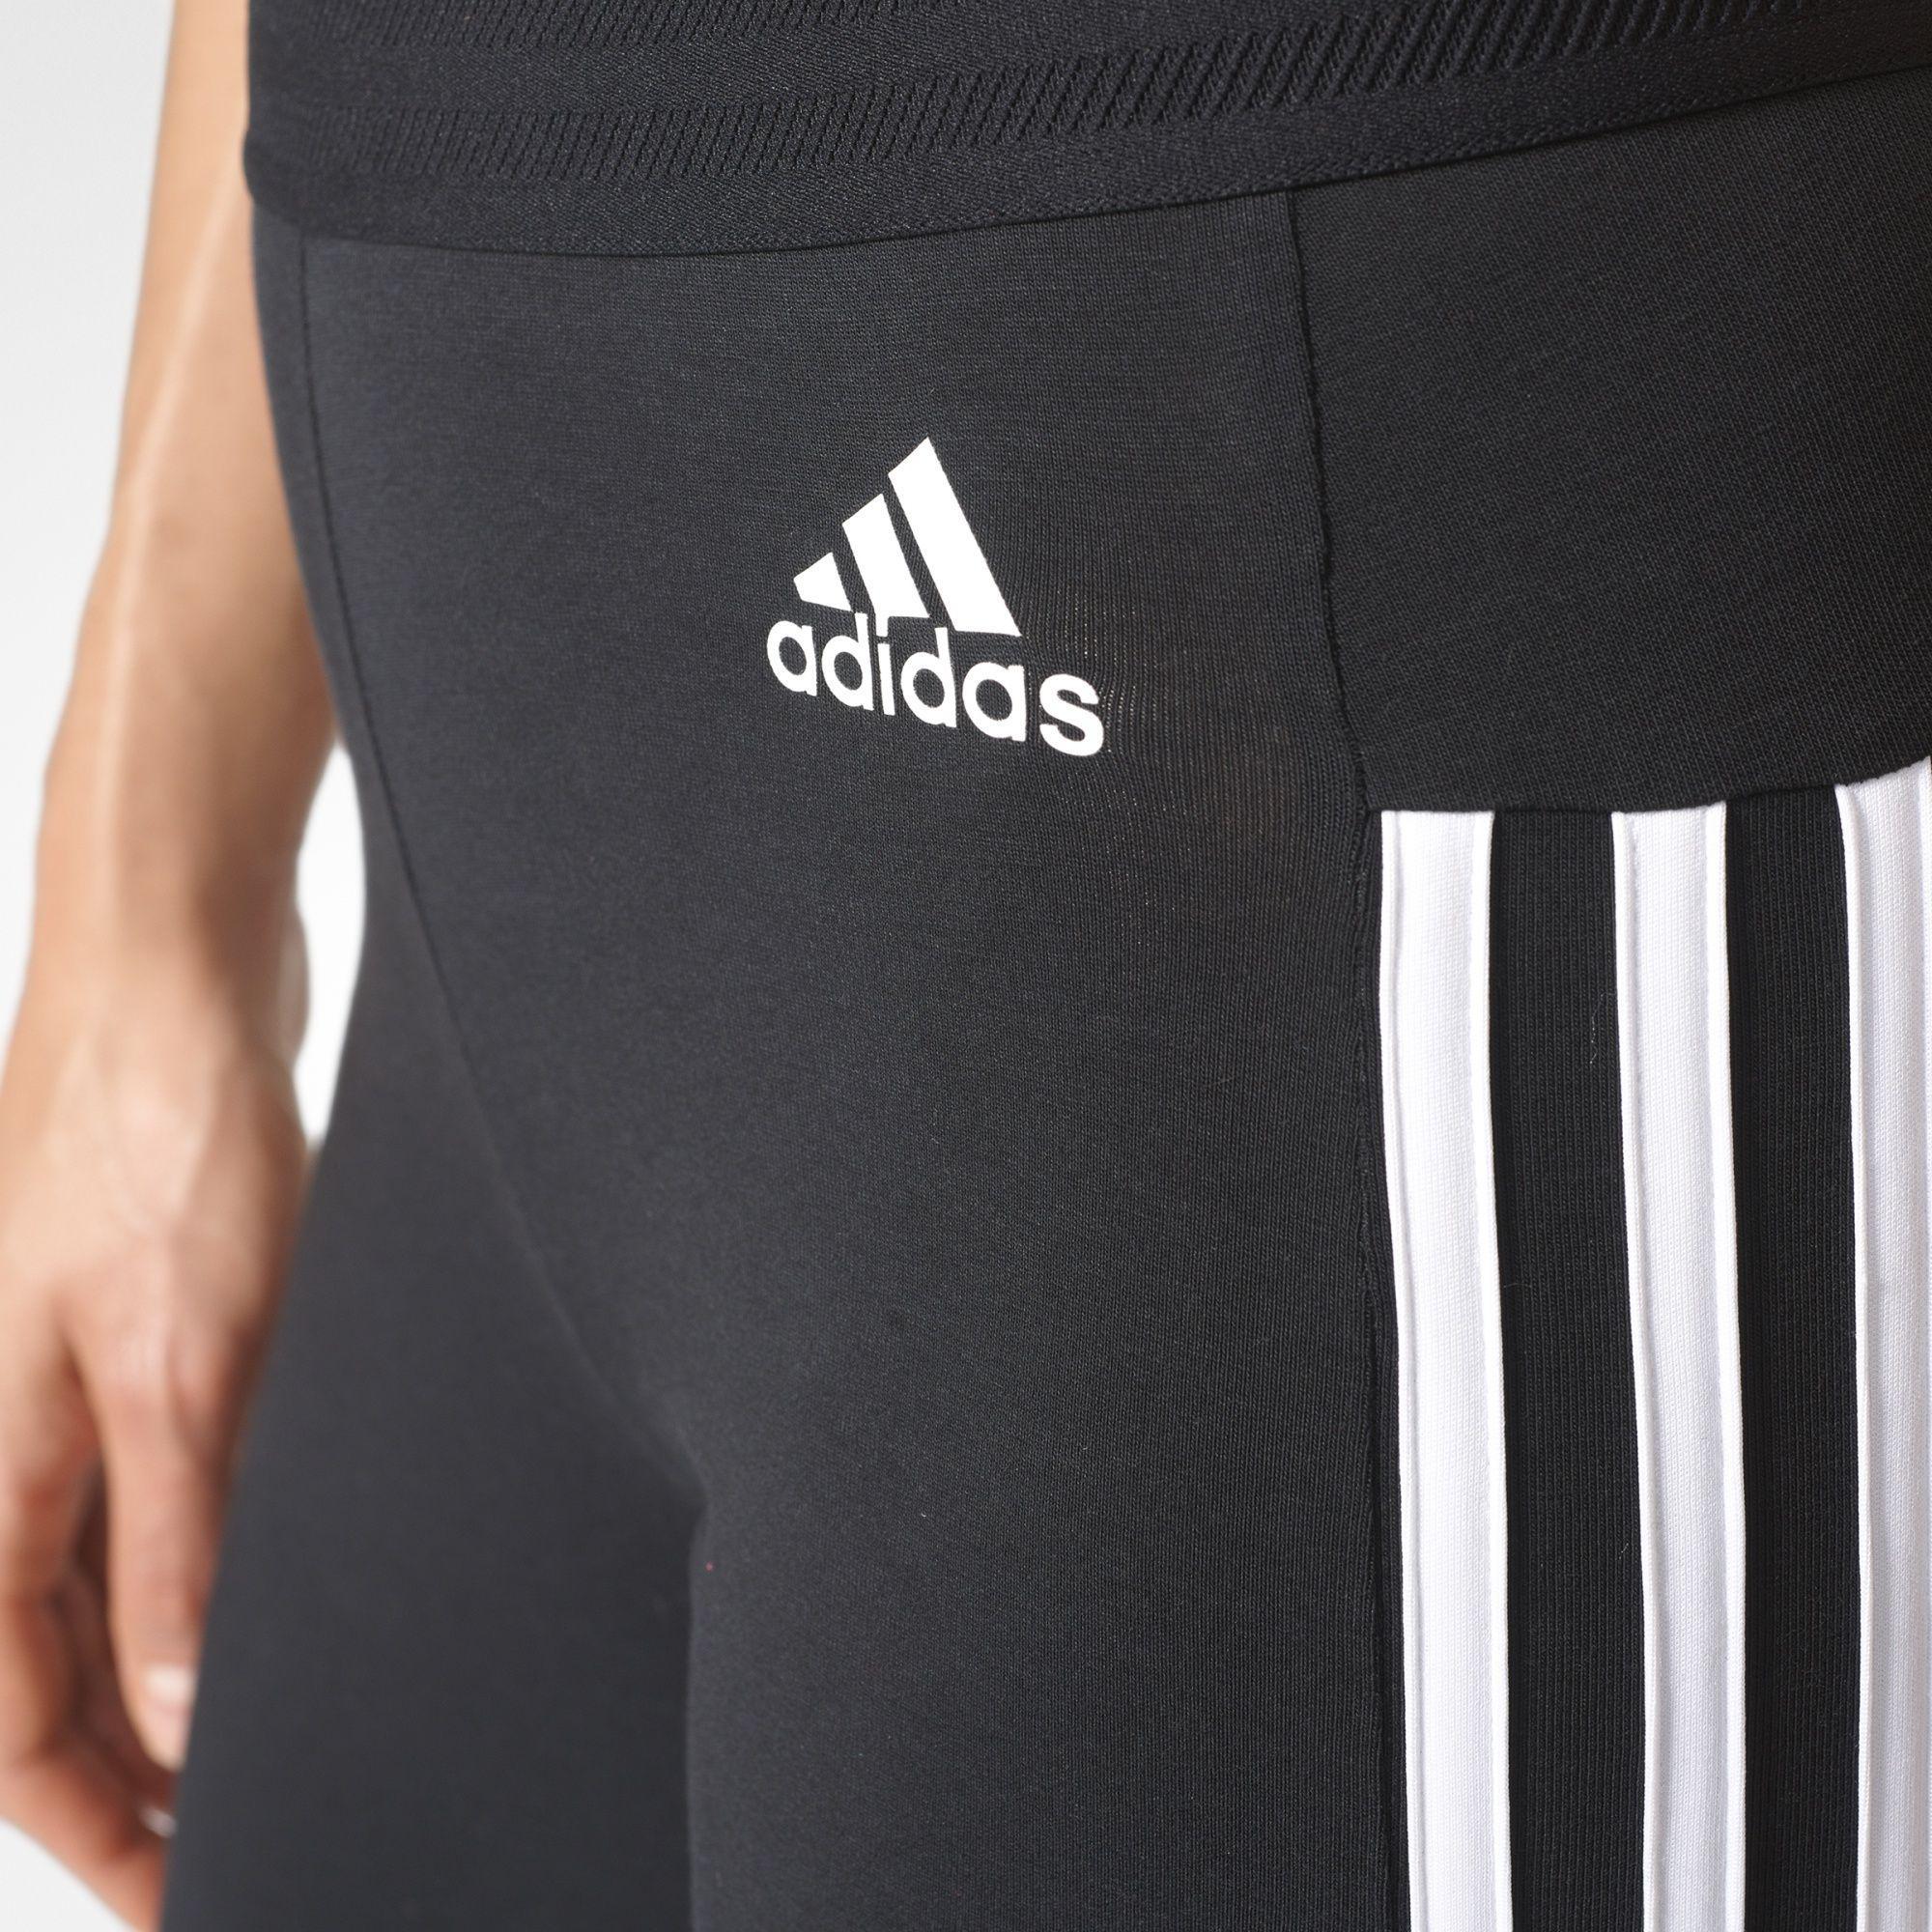 acbea10c82bd6 Adidas Womens Essentials 3-Stripe Tights - Black - Tennisnuts.com